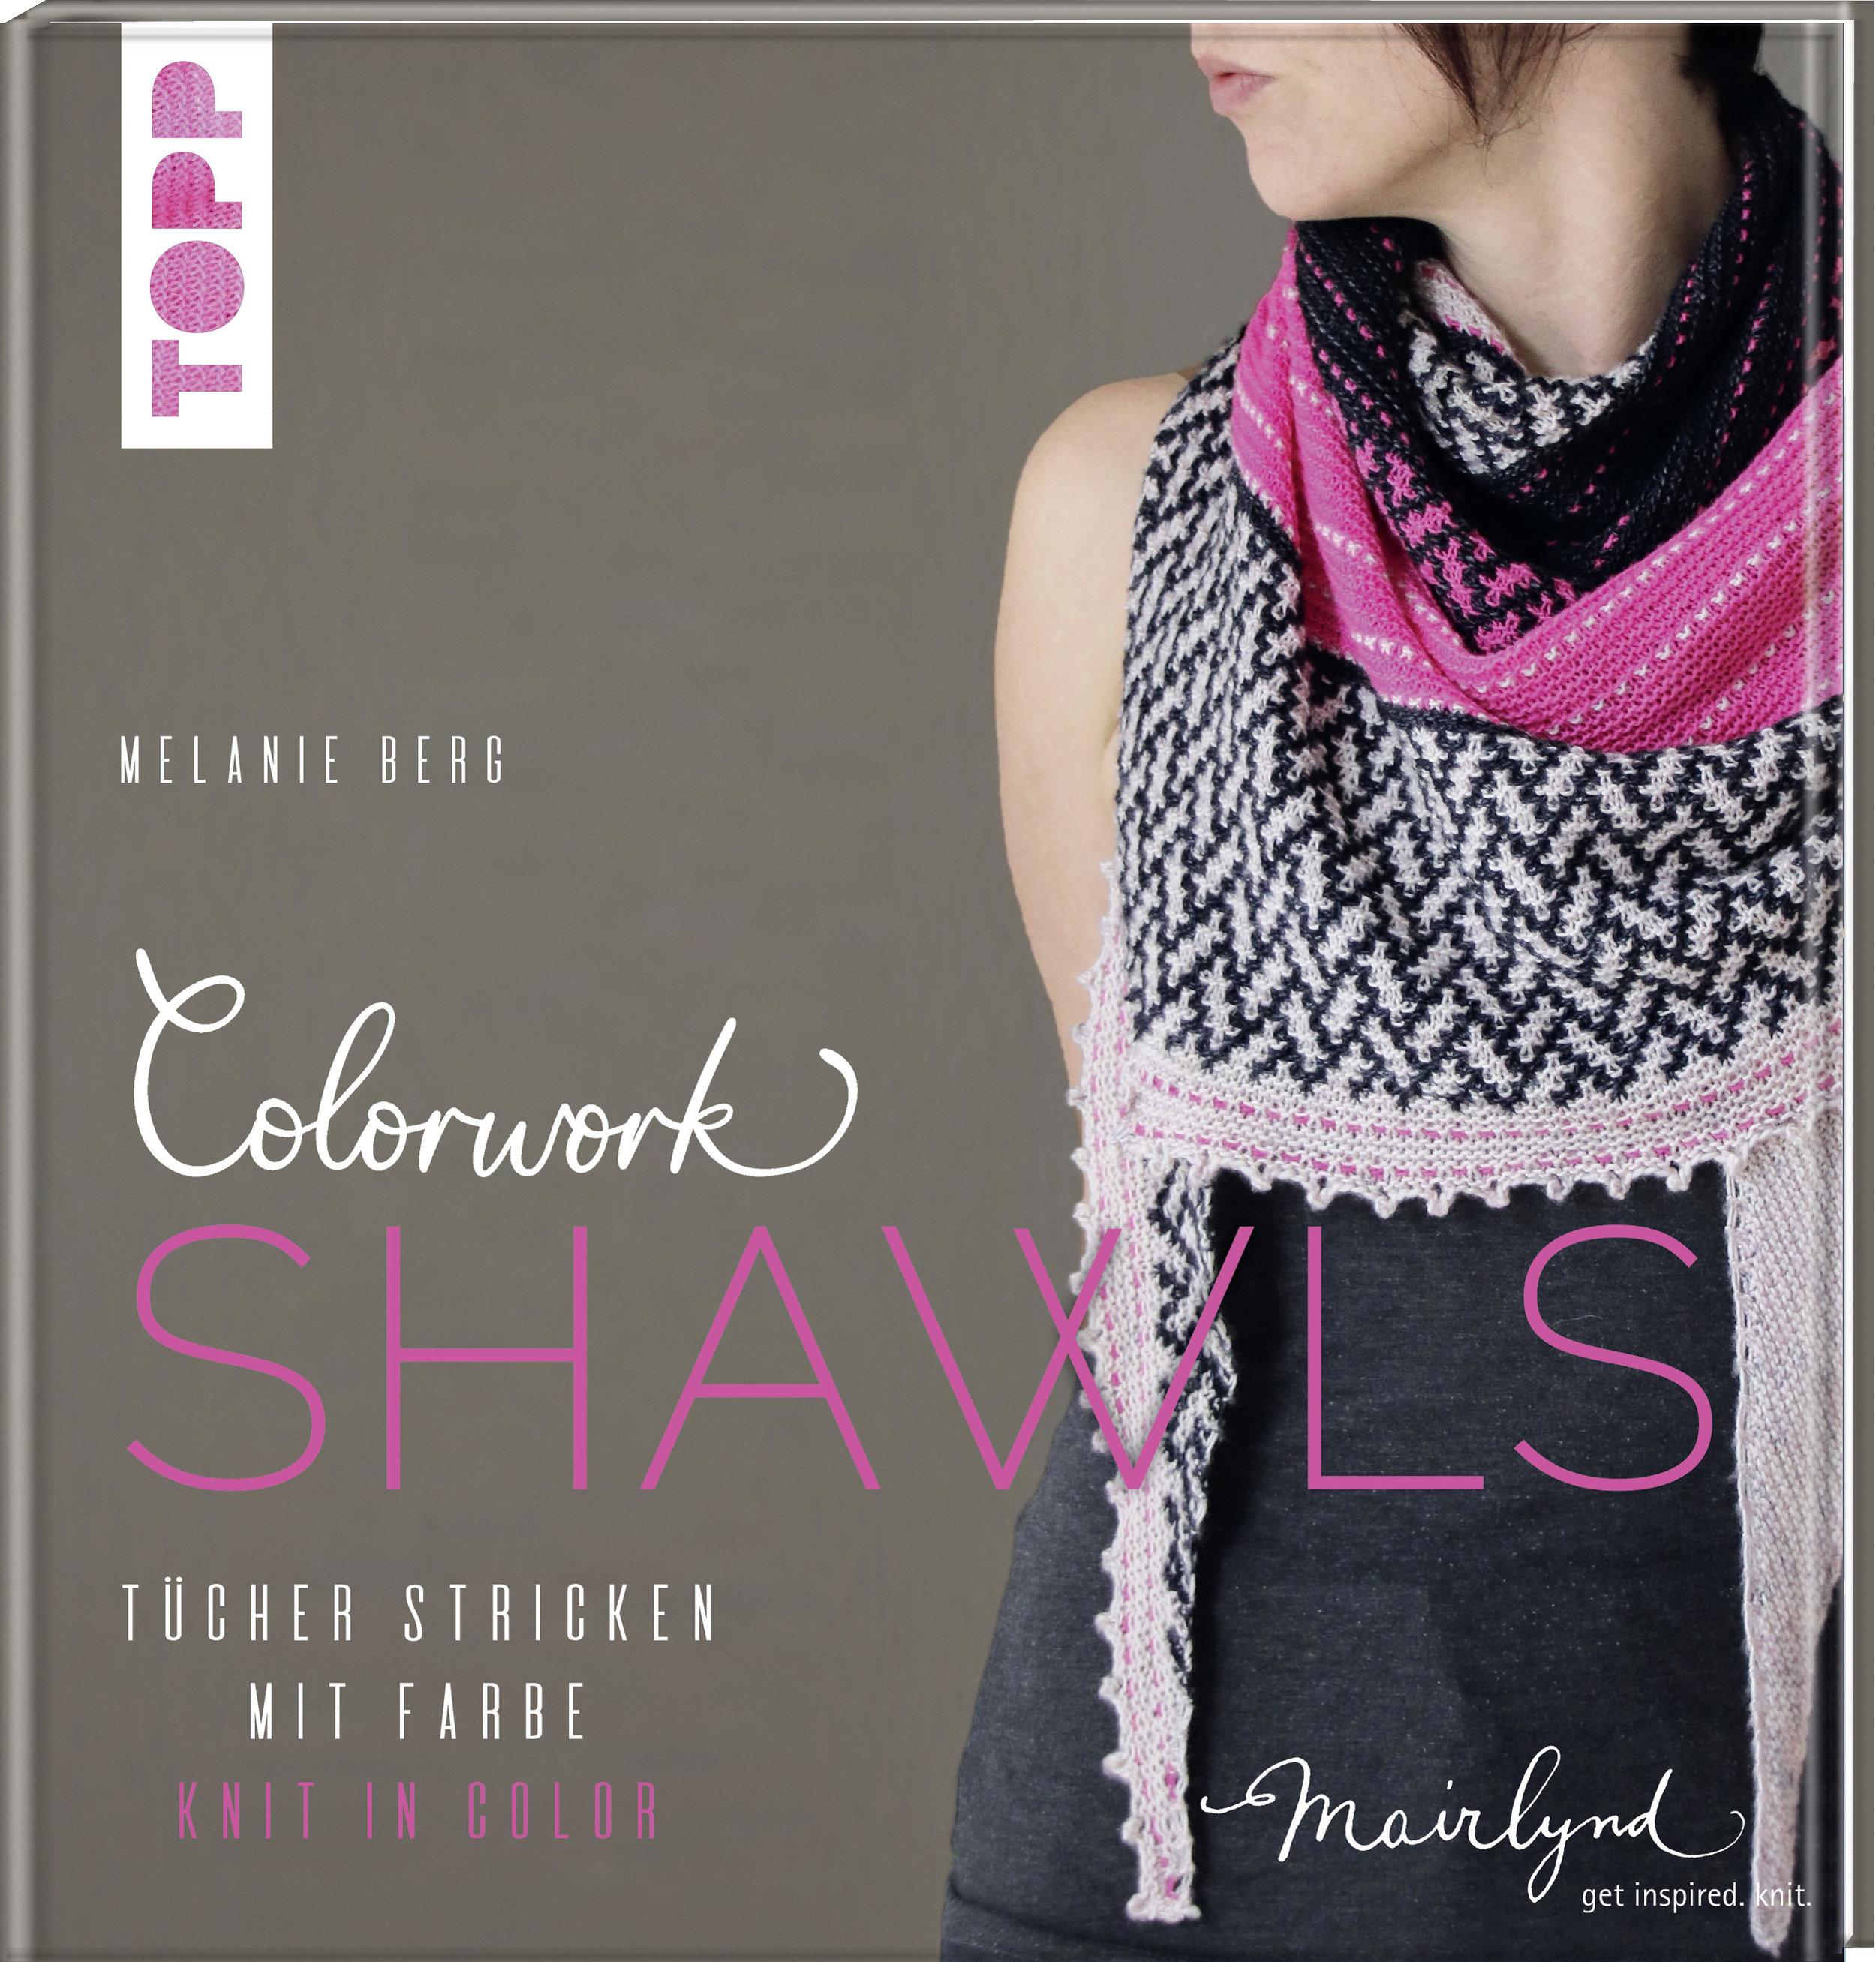 Colorwork Shawls book cover.jpg